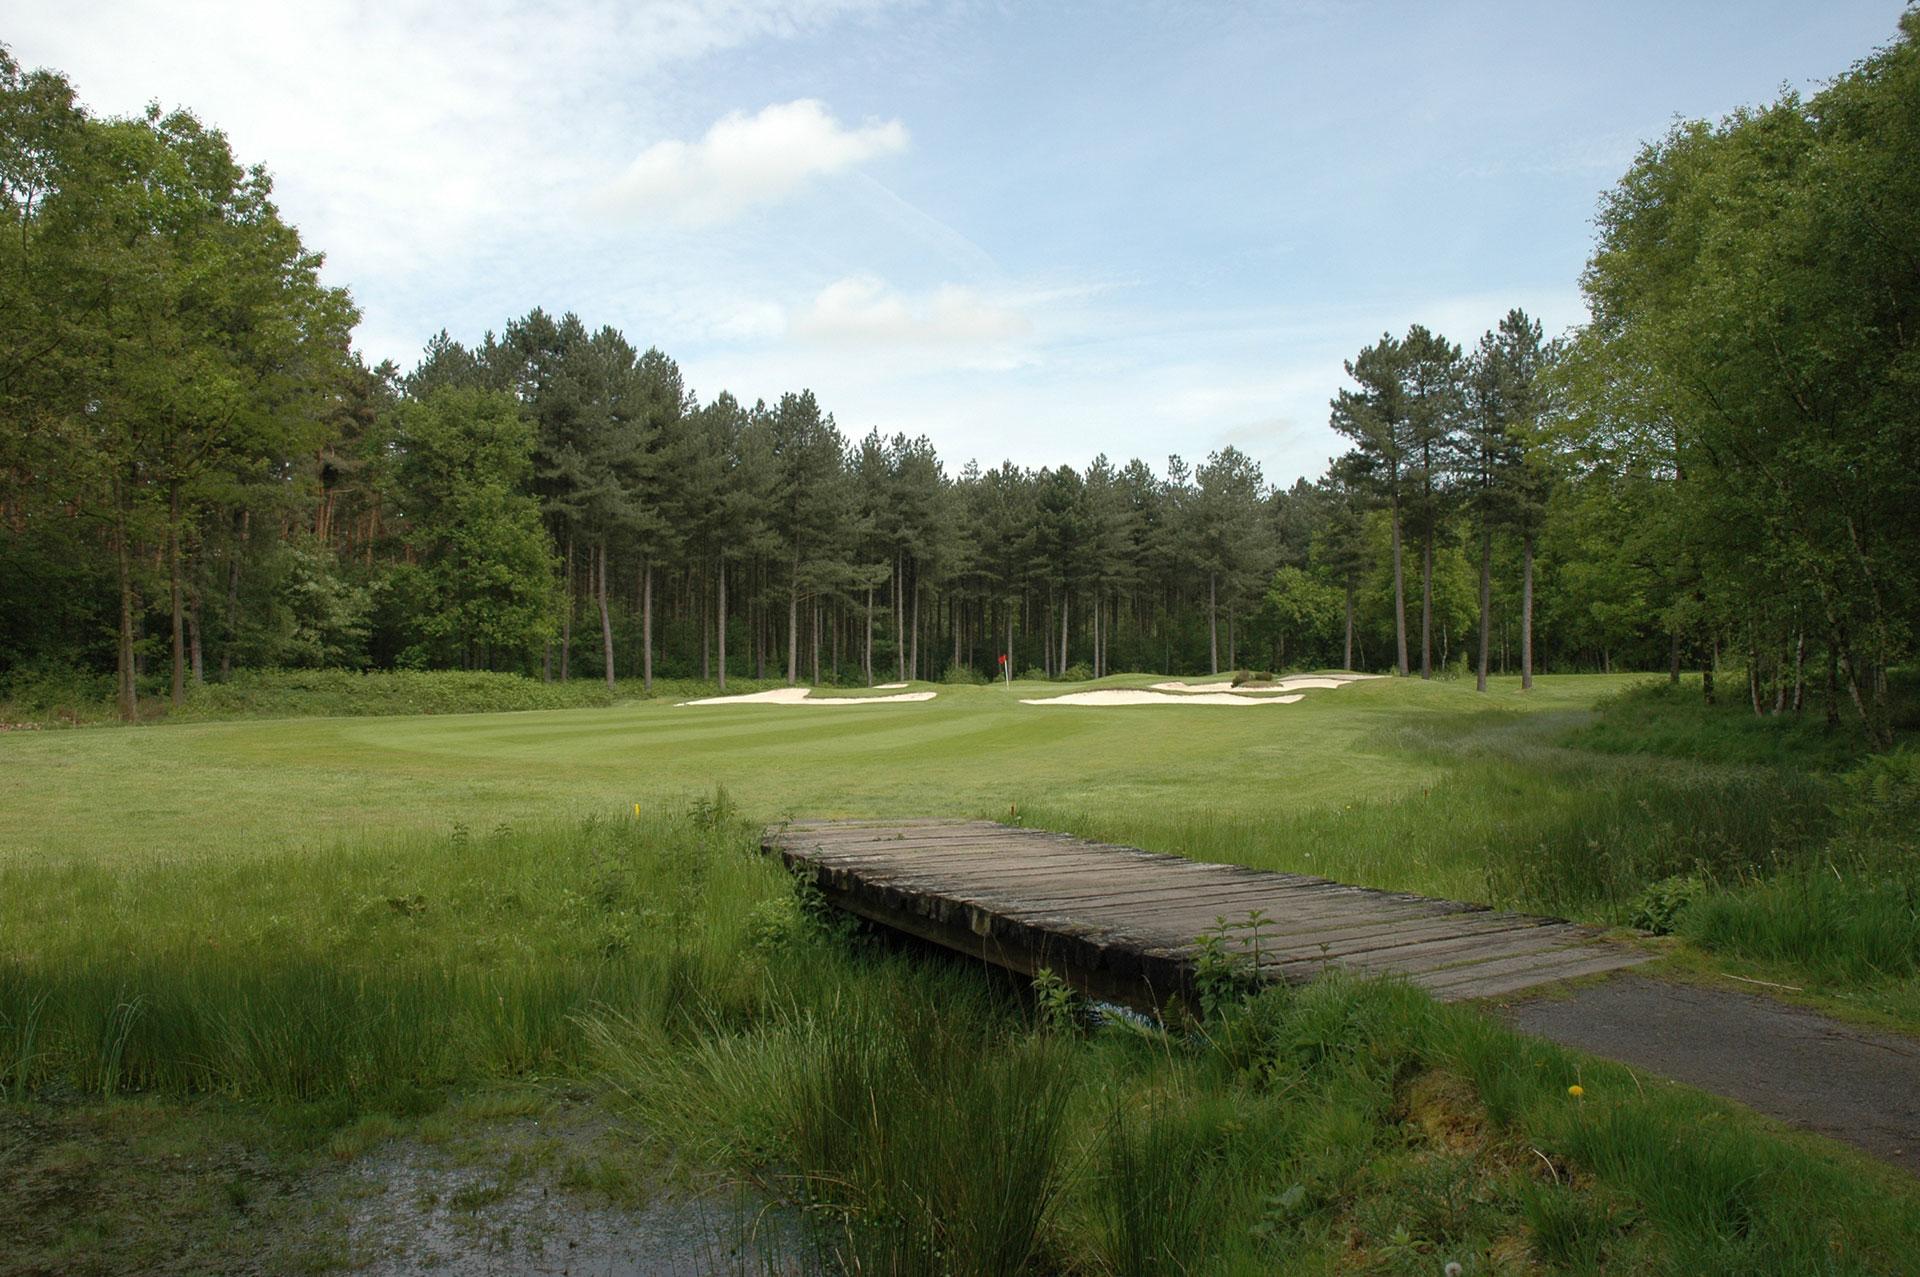 Royal Golf Club - Hainaut